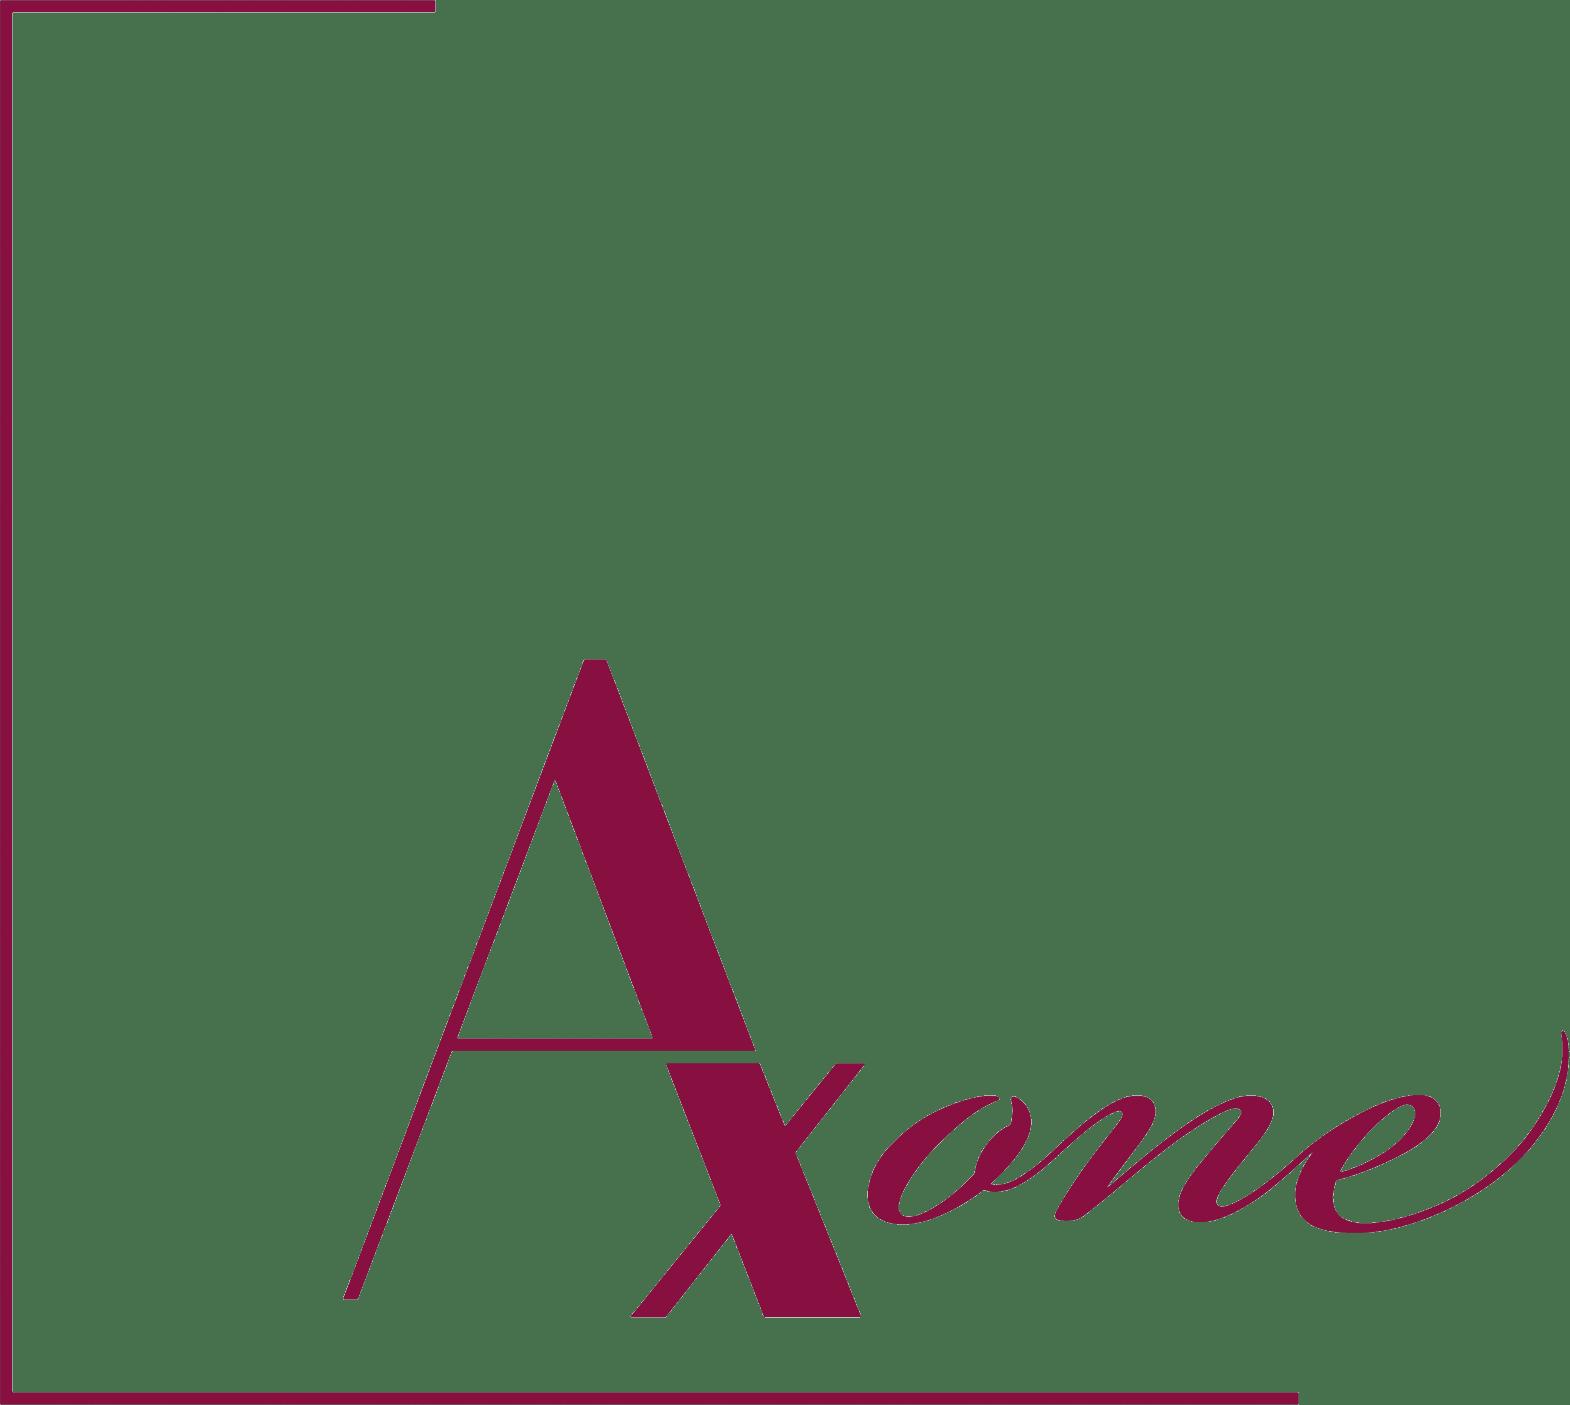 AXone Thérapies – Frédéric Hébert – Caen / Mondeville